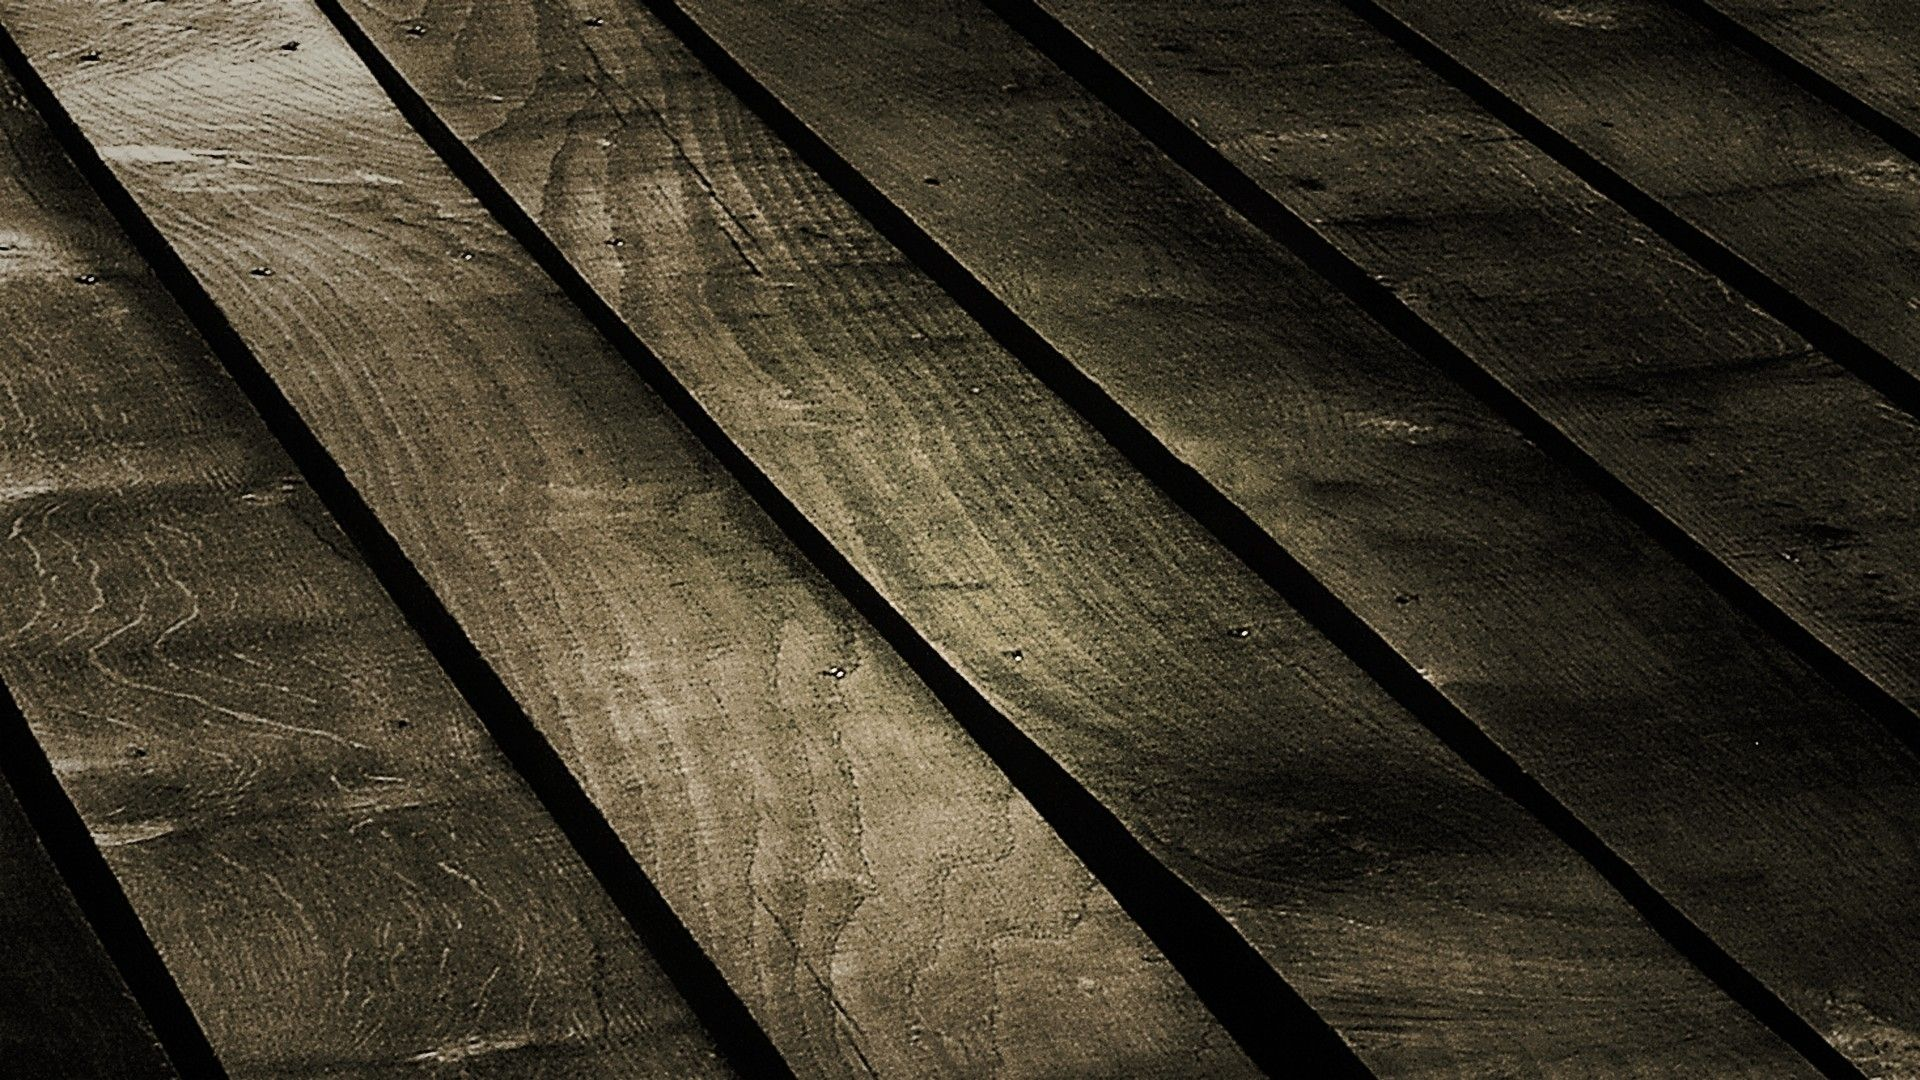 Hd wallpaper wood - Wood Background Hd Desktop Wallpaper High Definition